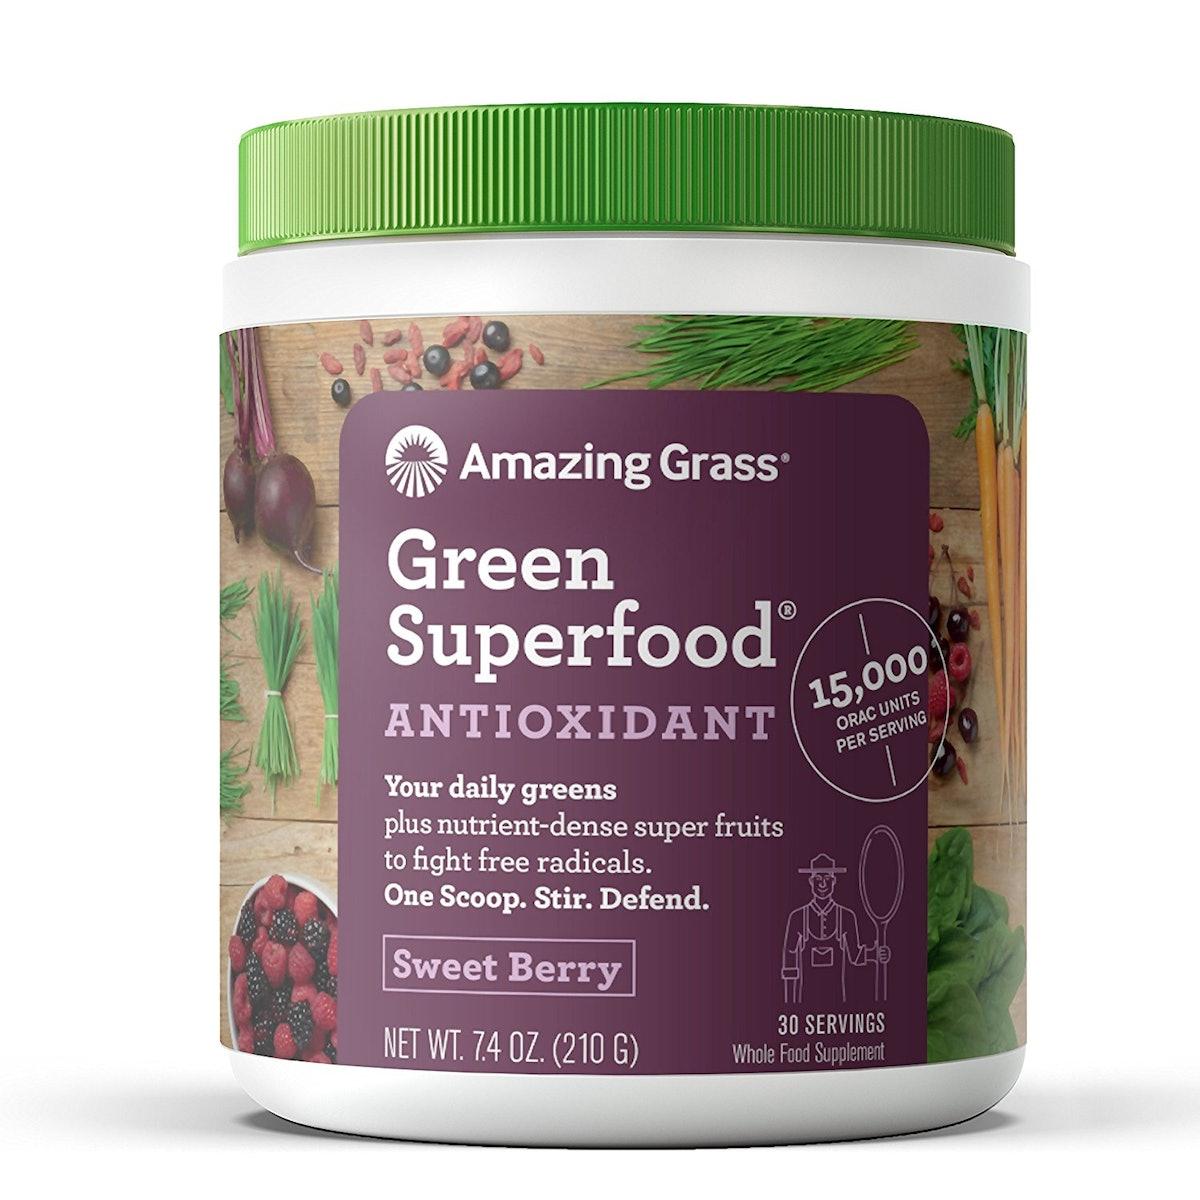 Amazing Grass Antioxidant Green Superfood Powder, Sweet Berry, 30 Servings